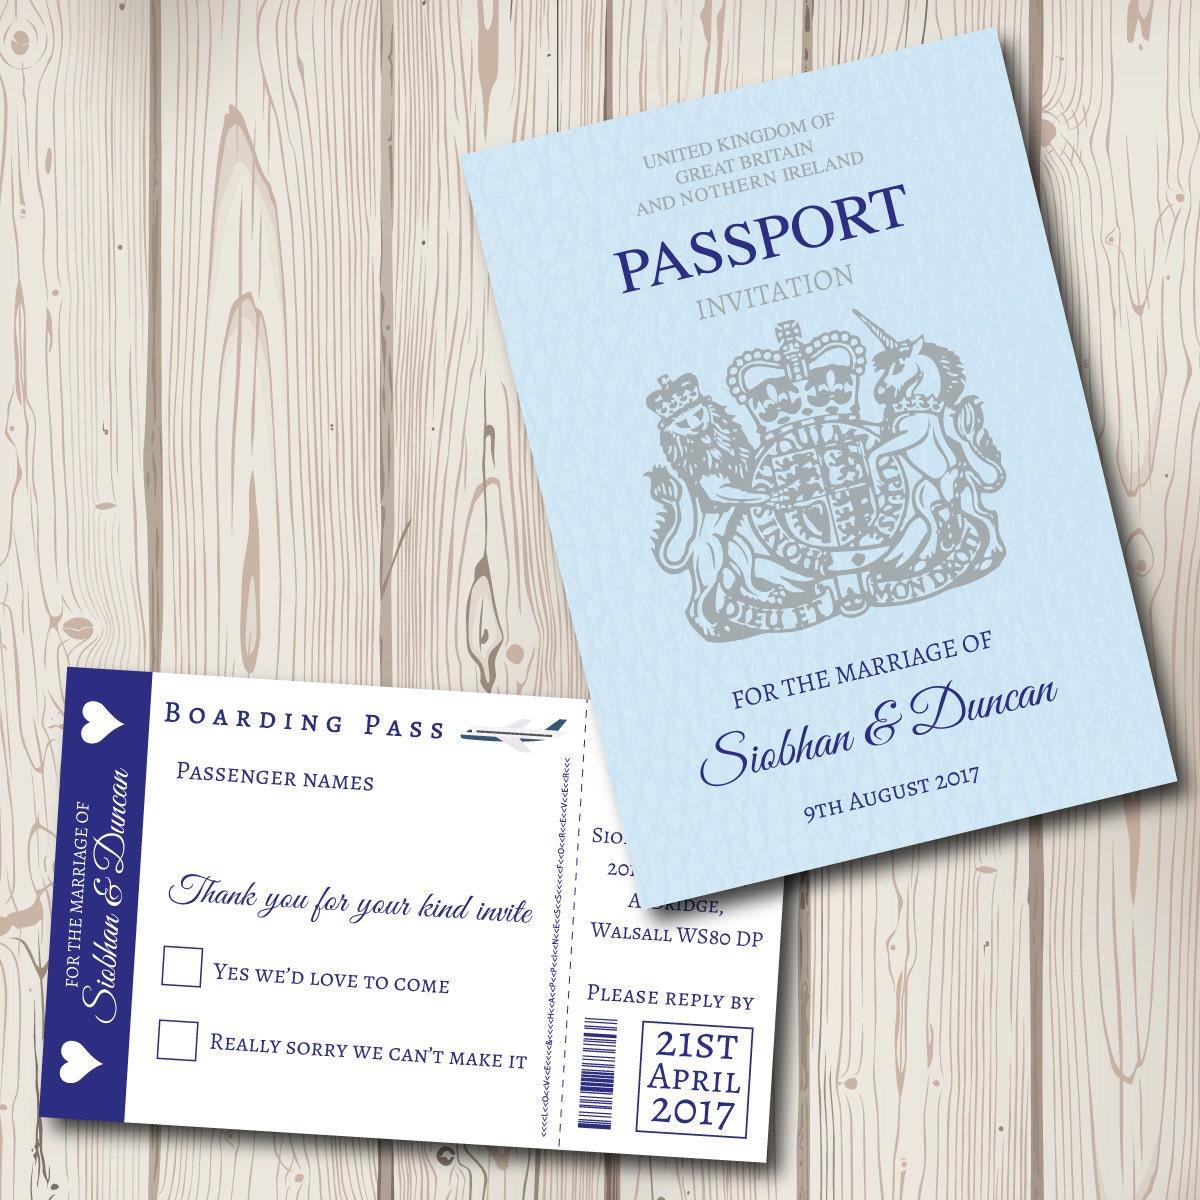 Passport Wedding Invitation with boarding pass rsvp